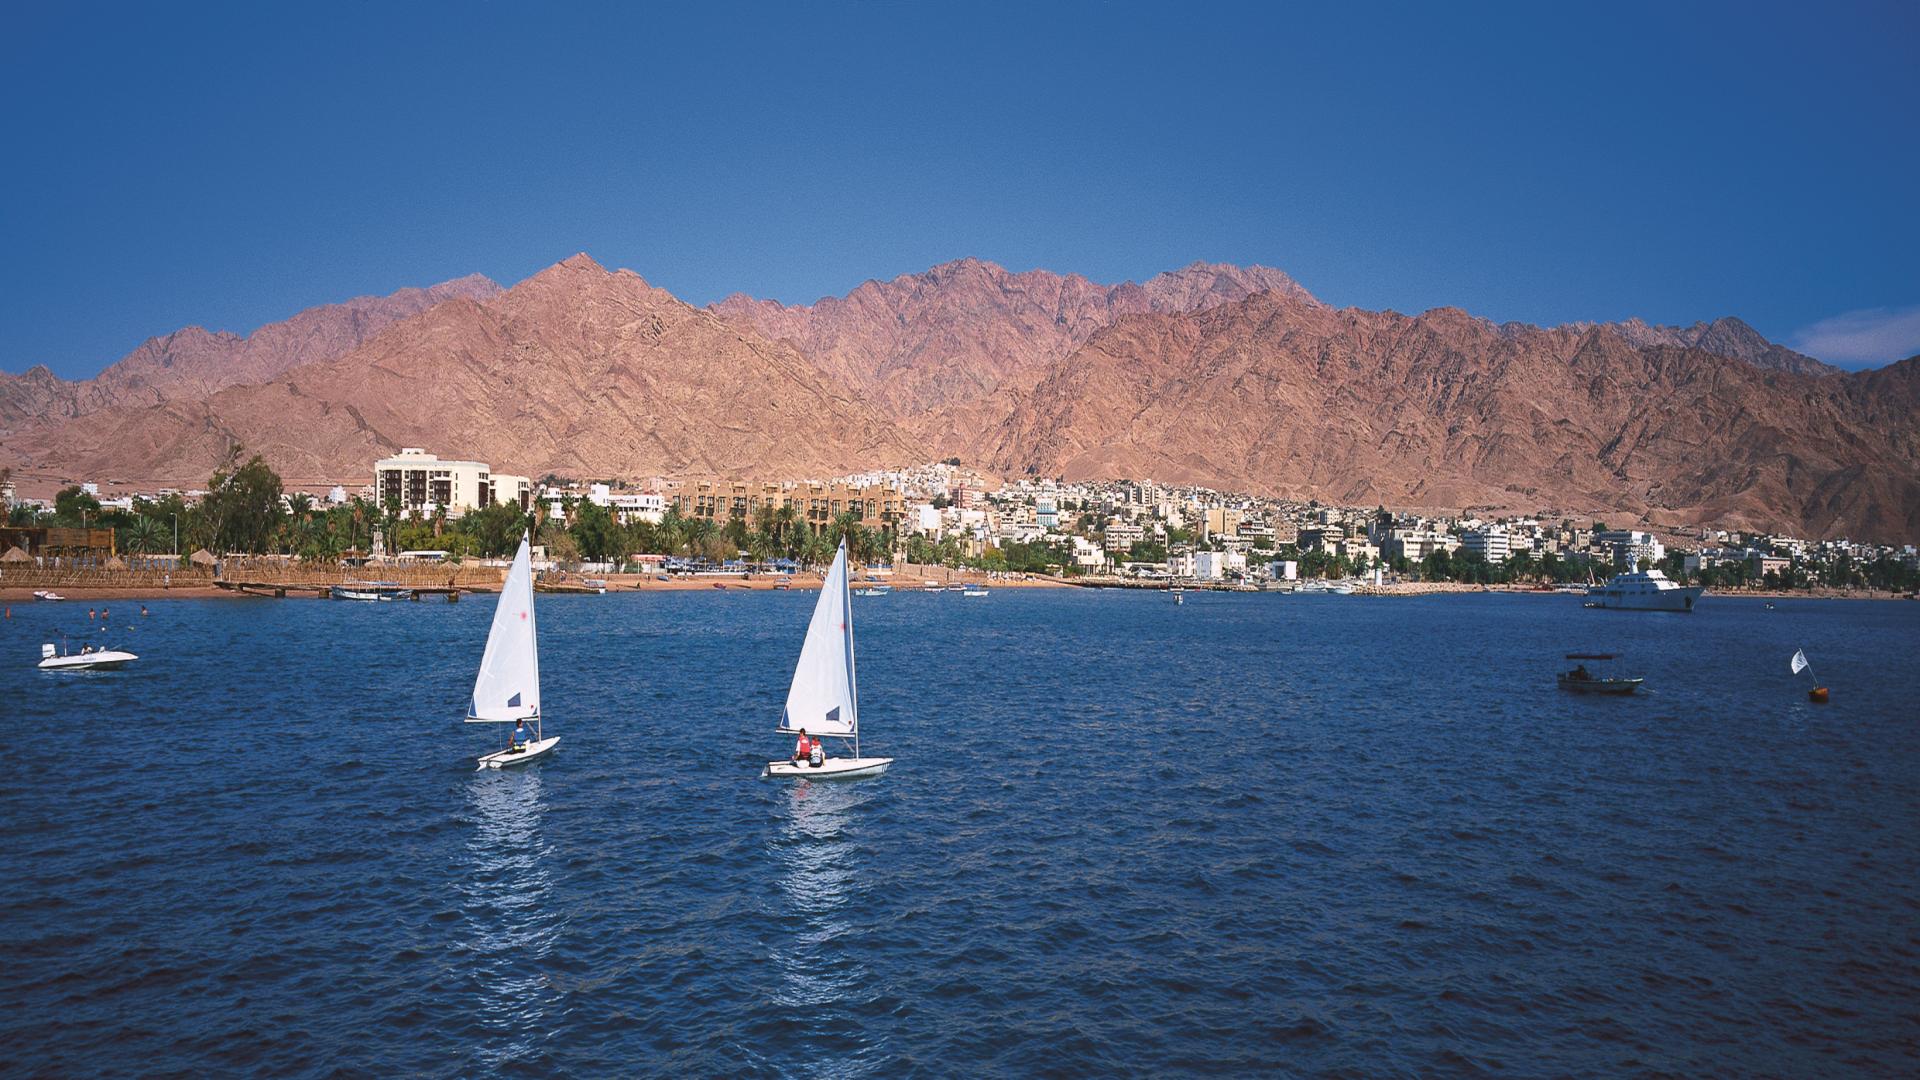 Bootjes bij Aqaba, Jordanië